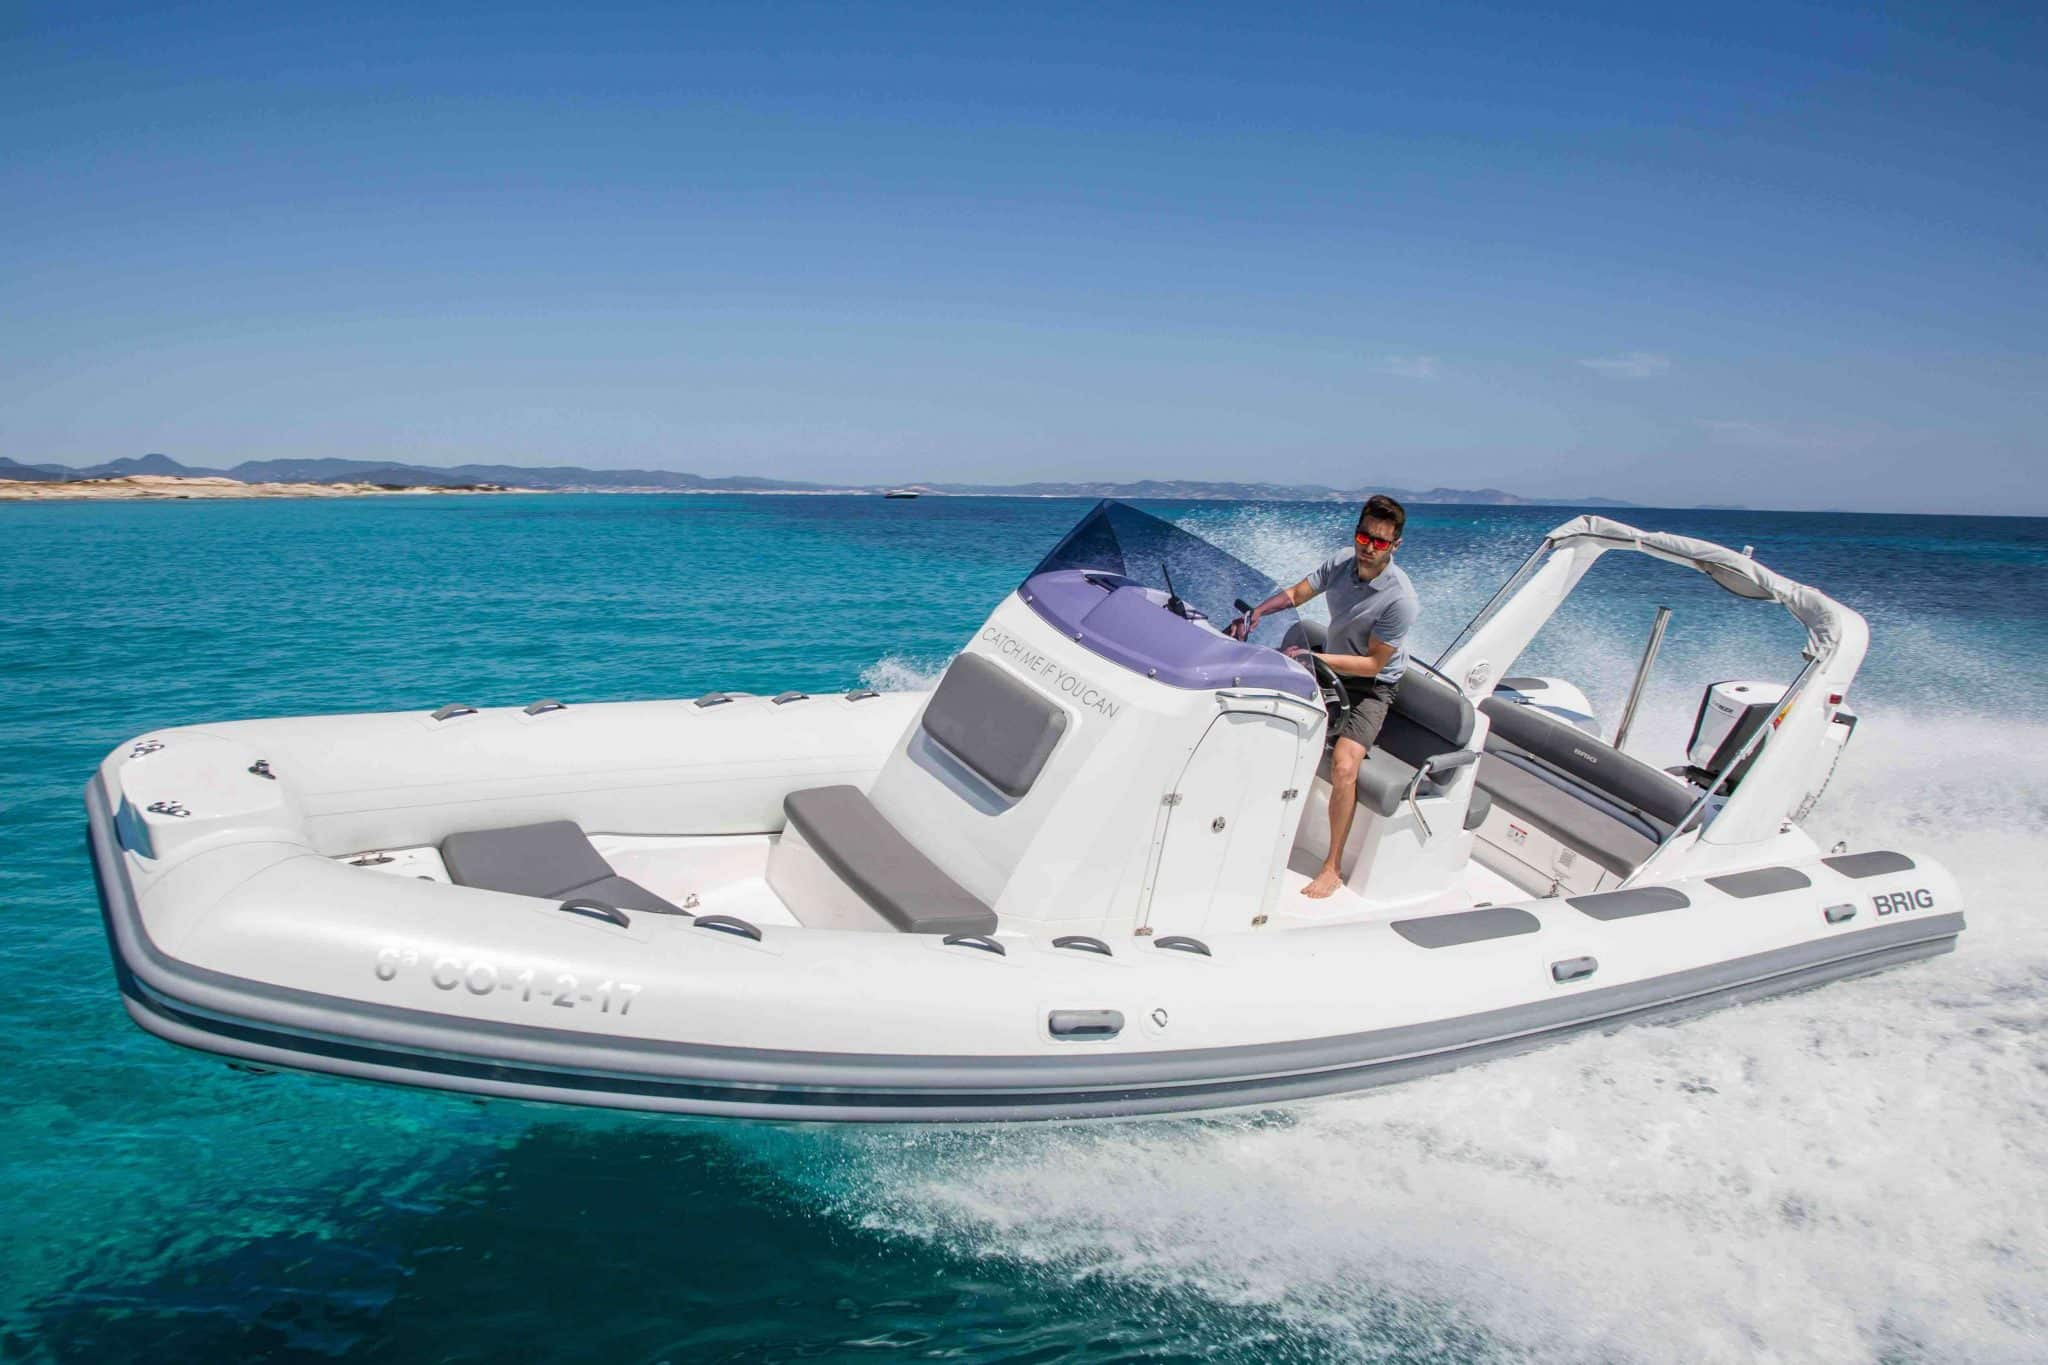 Brig 780 Ibiza speed